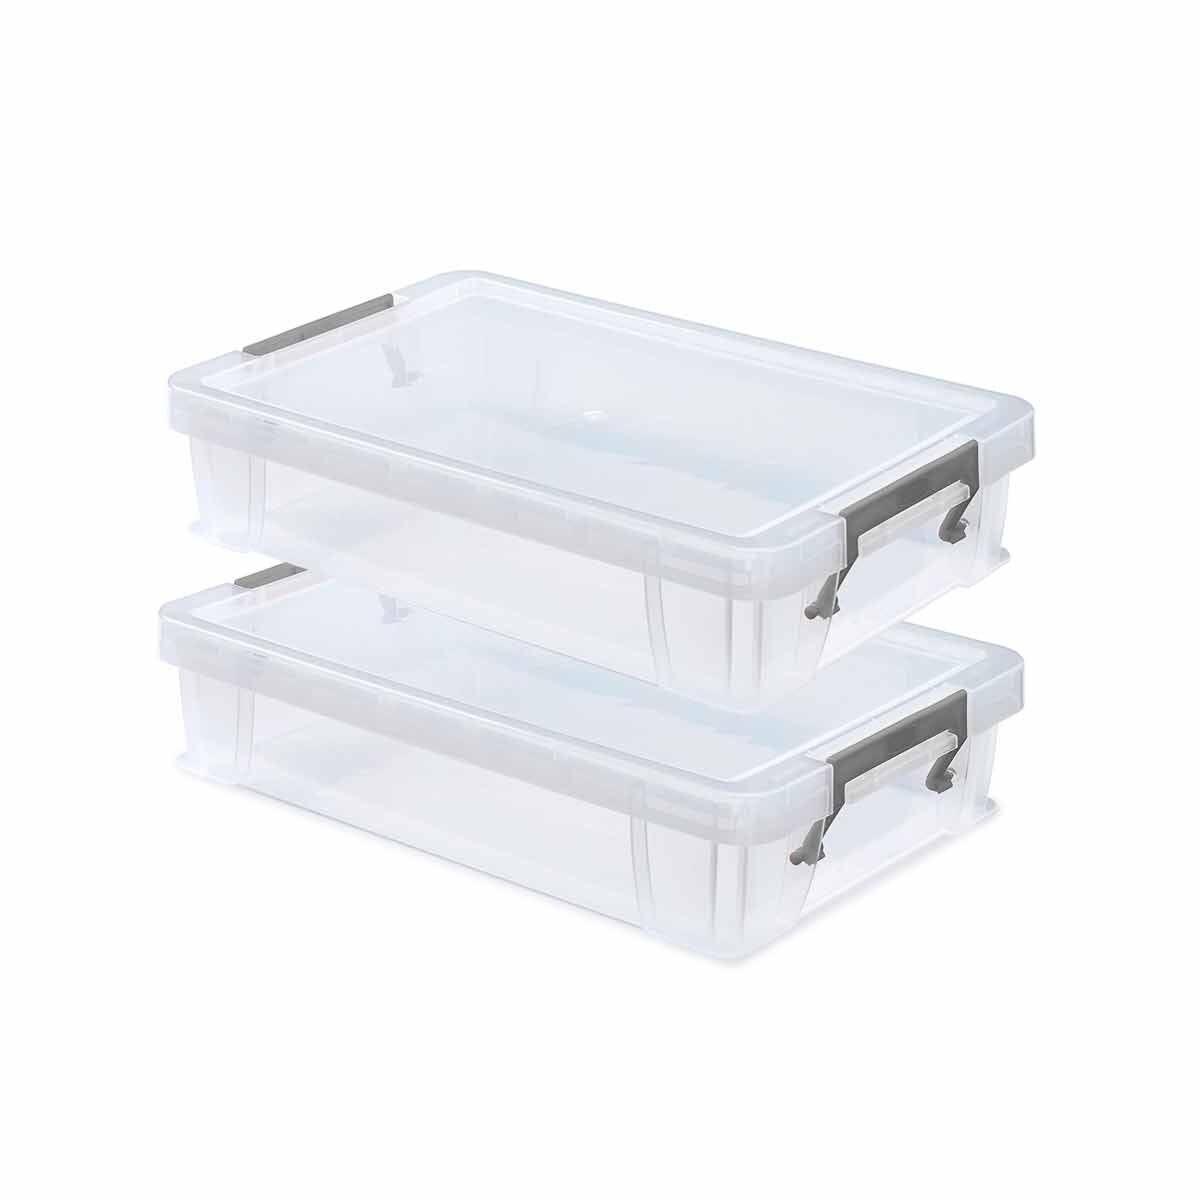 Whitefurze Allstore Plastic Storage Box 5.5 Litre Pack of 2